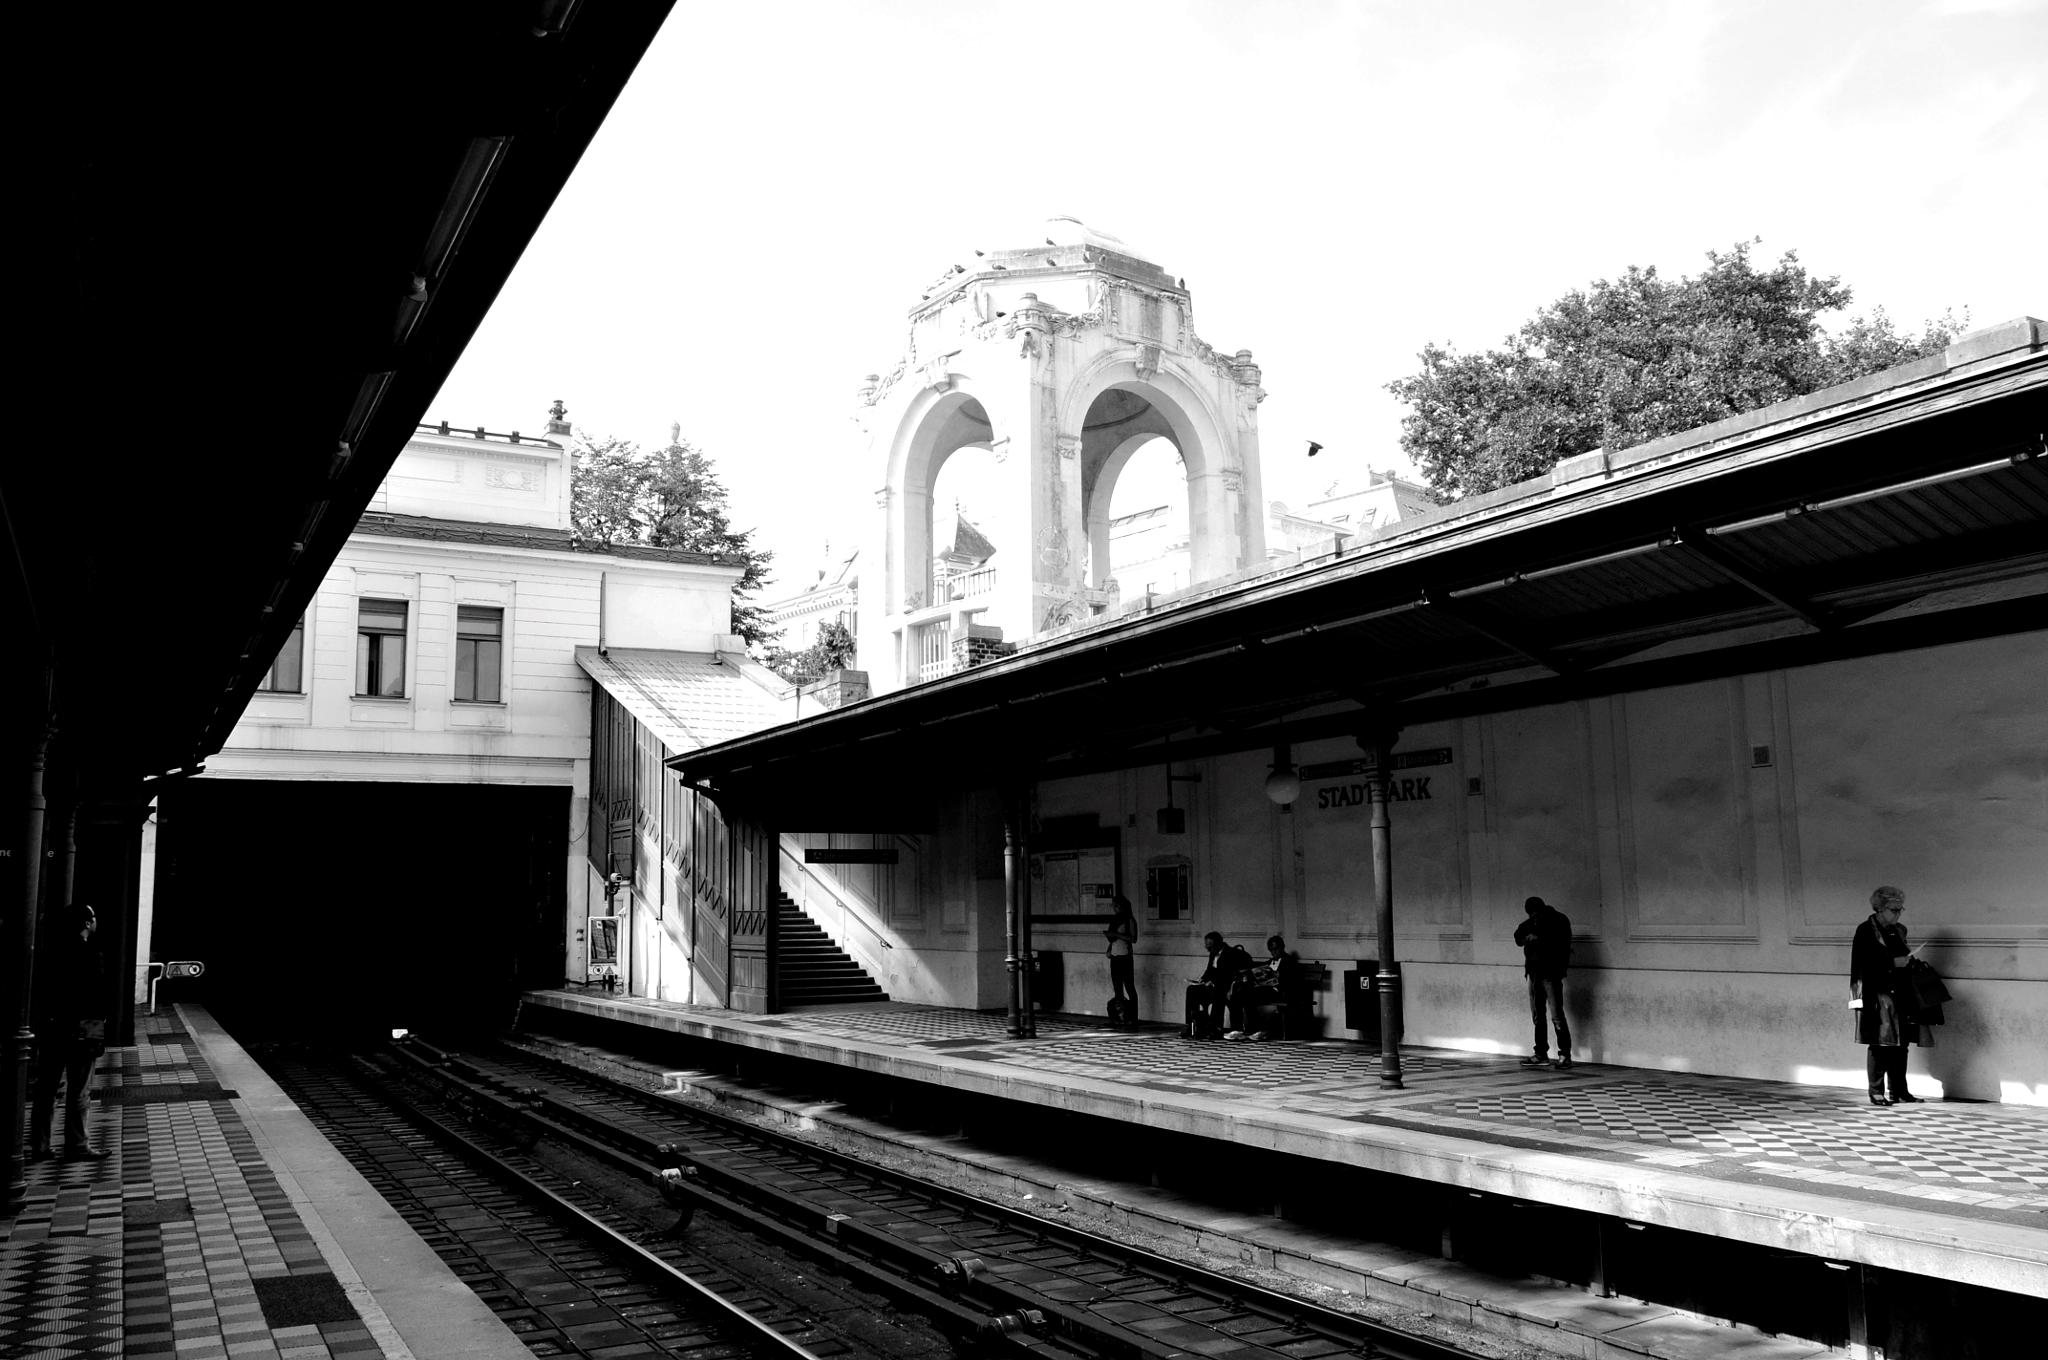 Stadtpark Station by tamara.seles